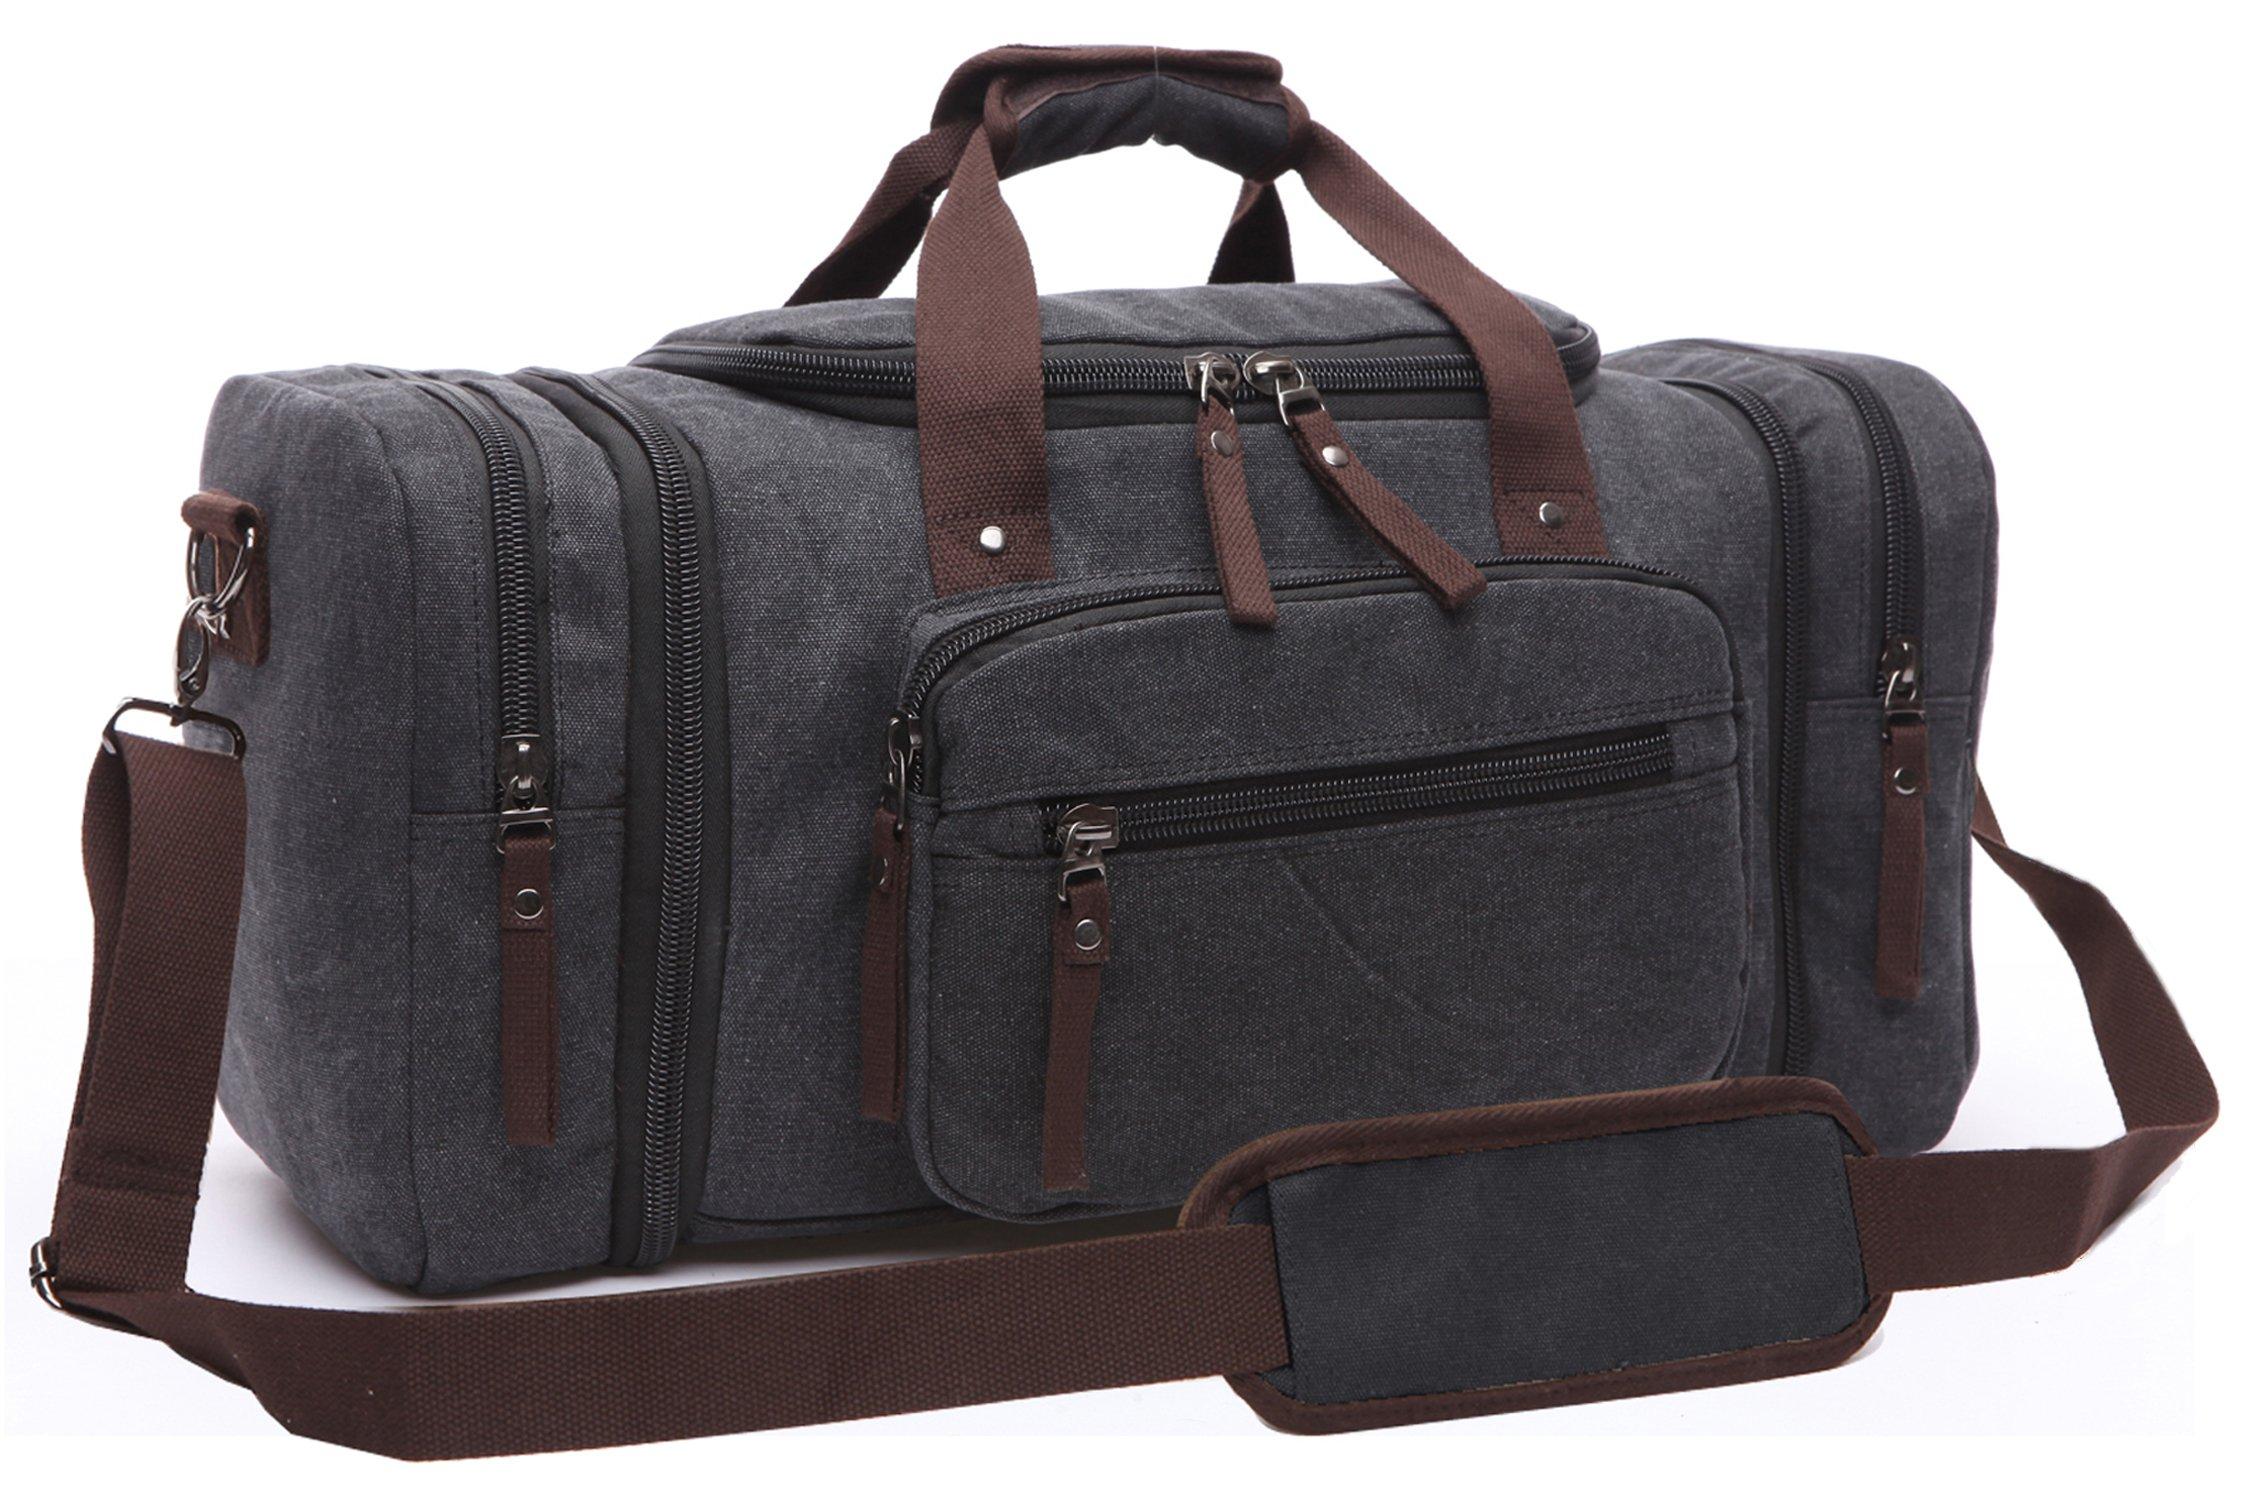 Canvas Duffel Bag, Aidonger Vintage Canvas Weekender Bag Travel Bag Sports Duffel with Shoulder Strap (Black)